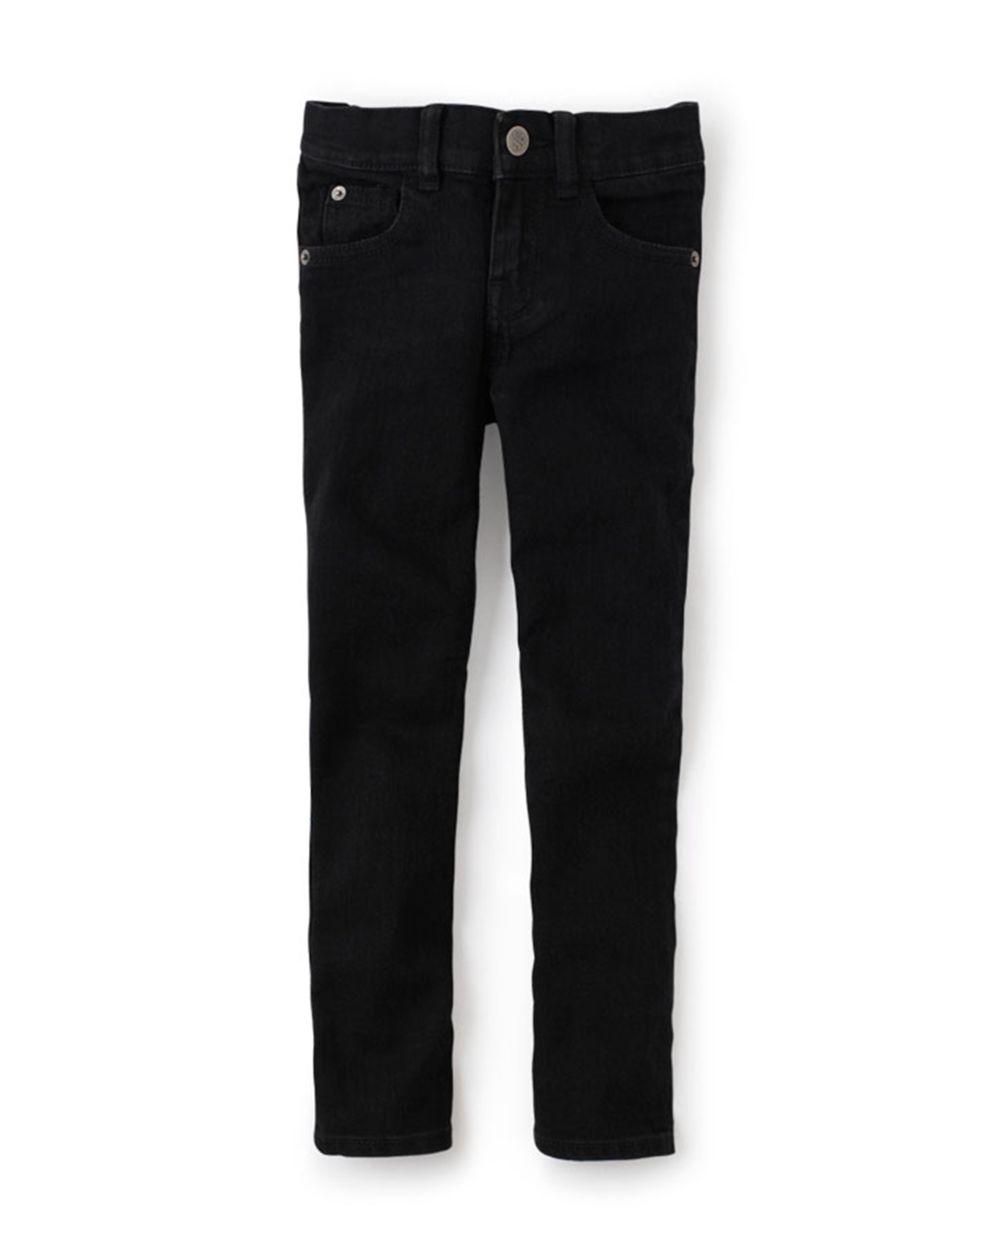 Promos Skinny Jeans - New Black